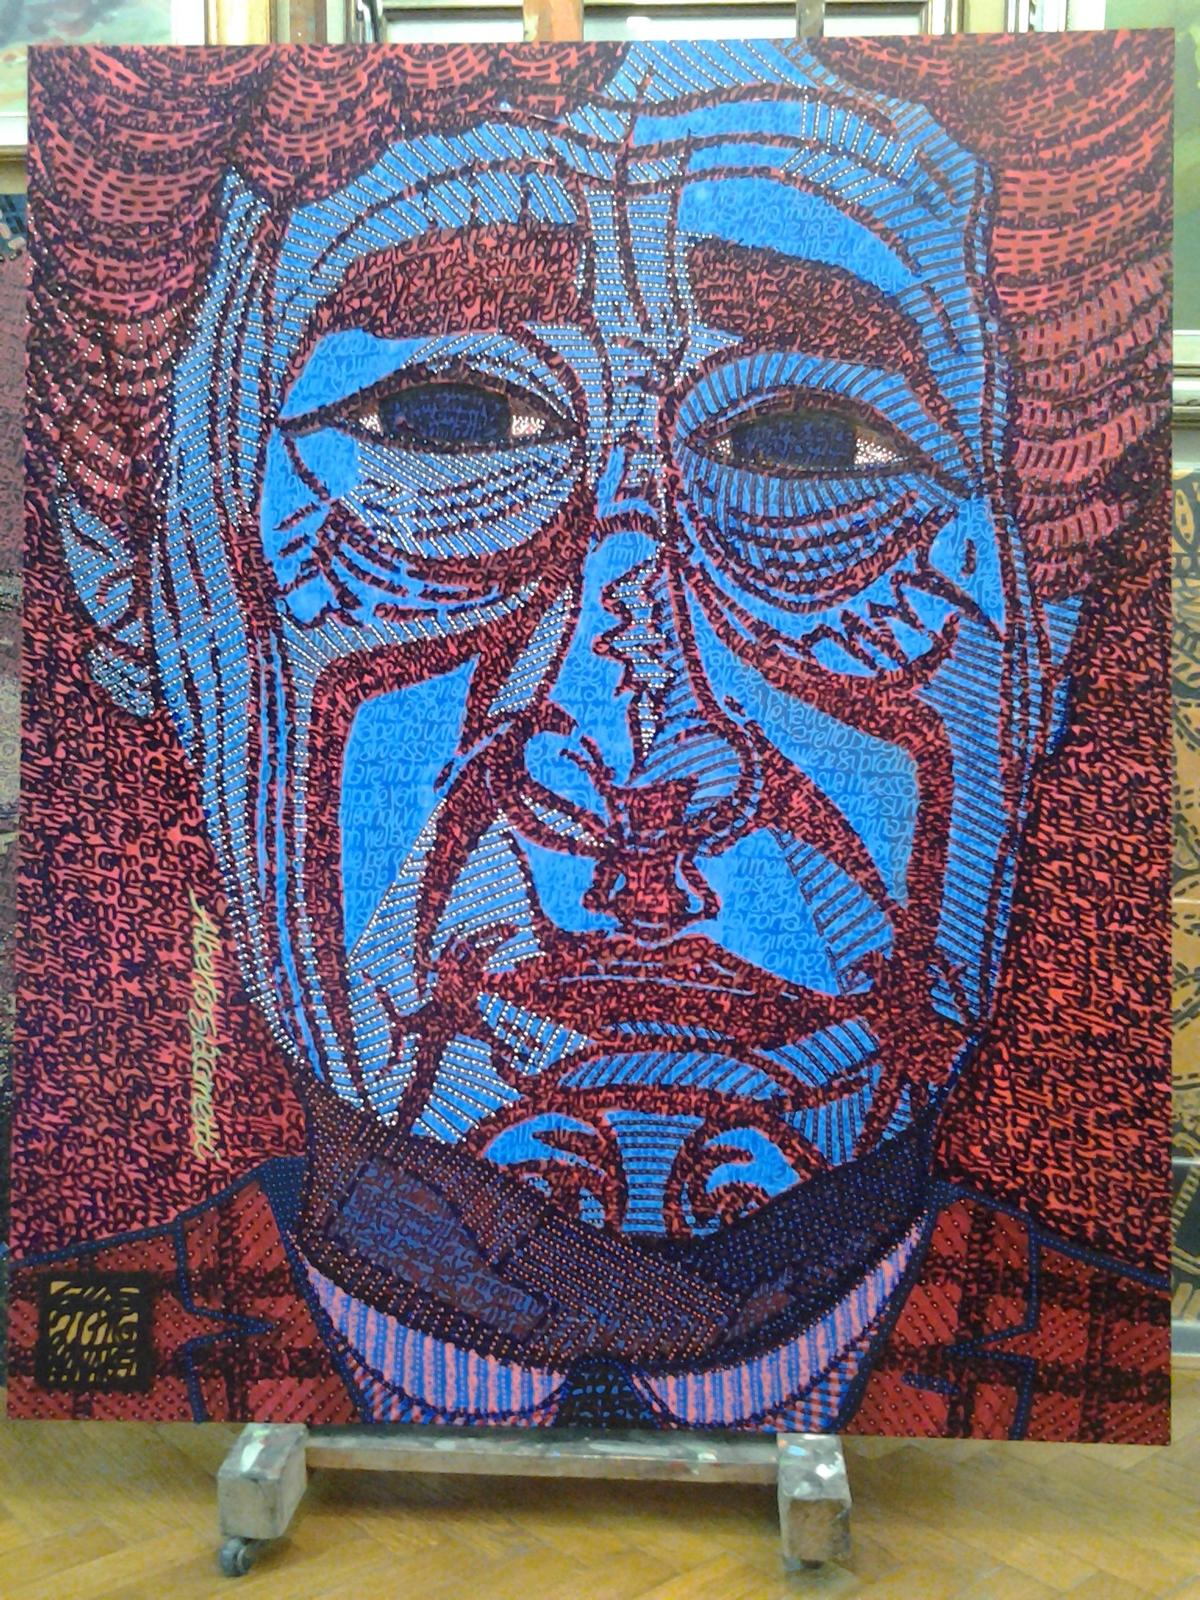 Tribute to Alberto Giacometti by Gios Manakel